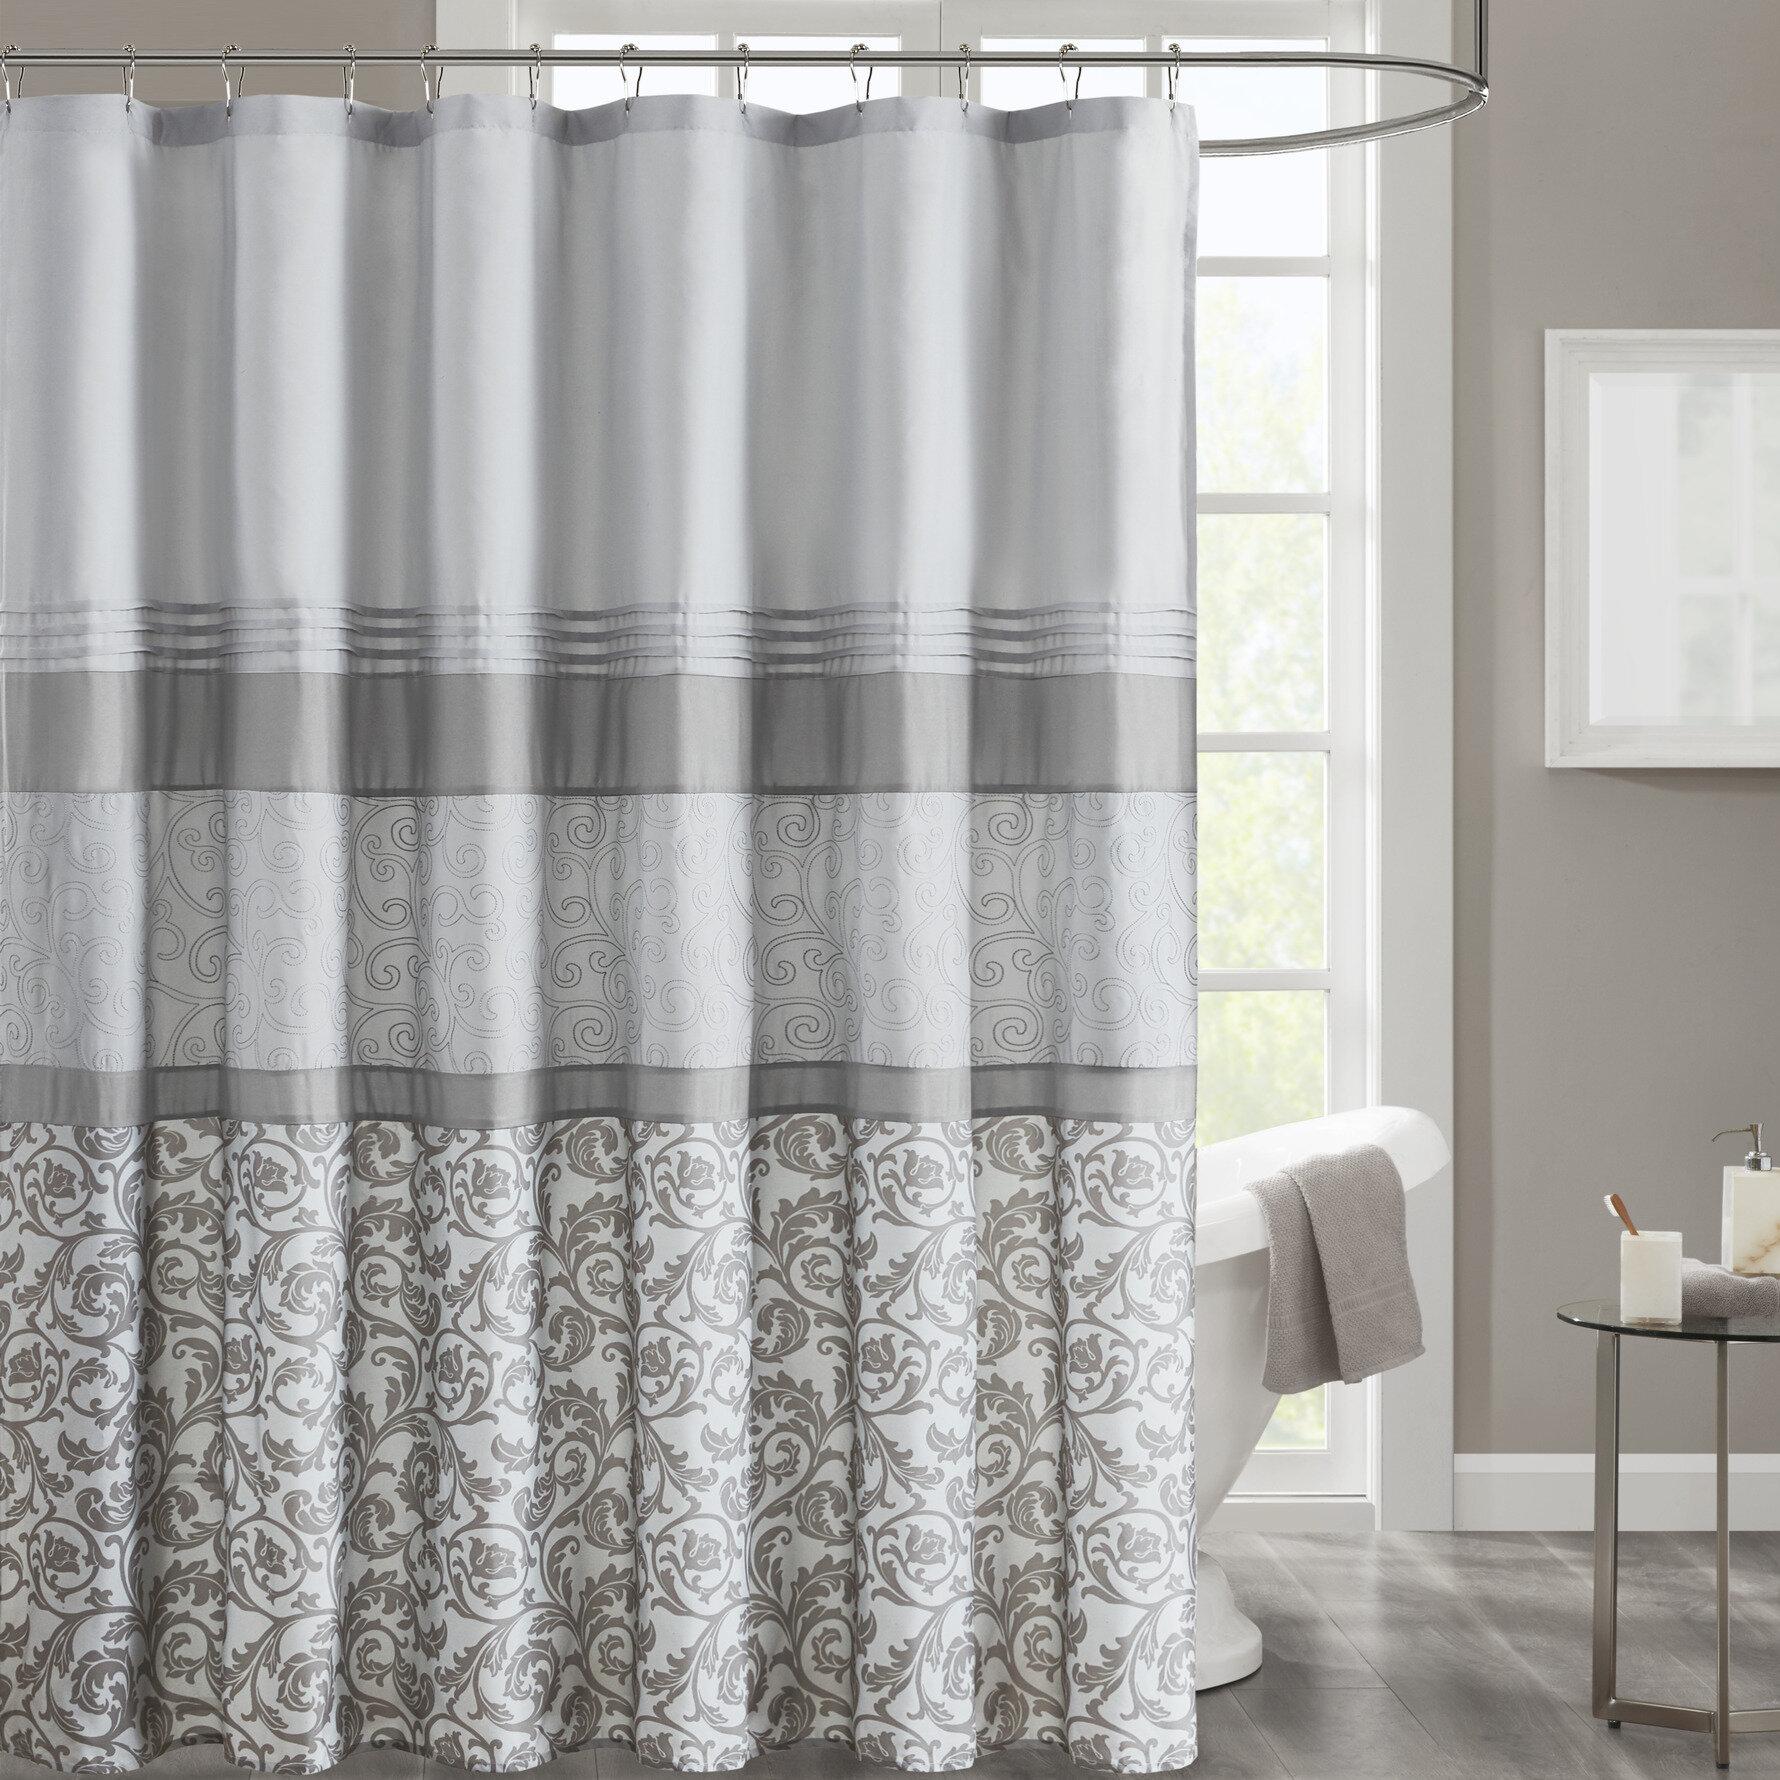 Ophelia Co Cherryford Microfiber Single Shower Curtain Reviews Wayfair